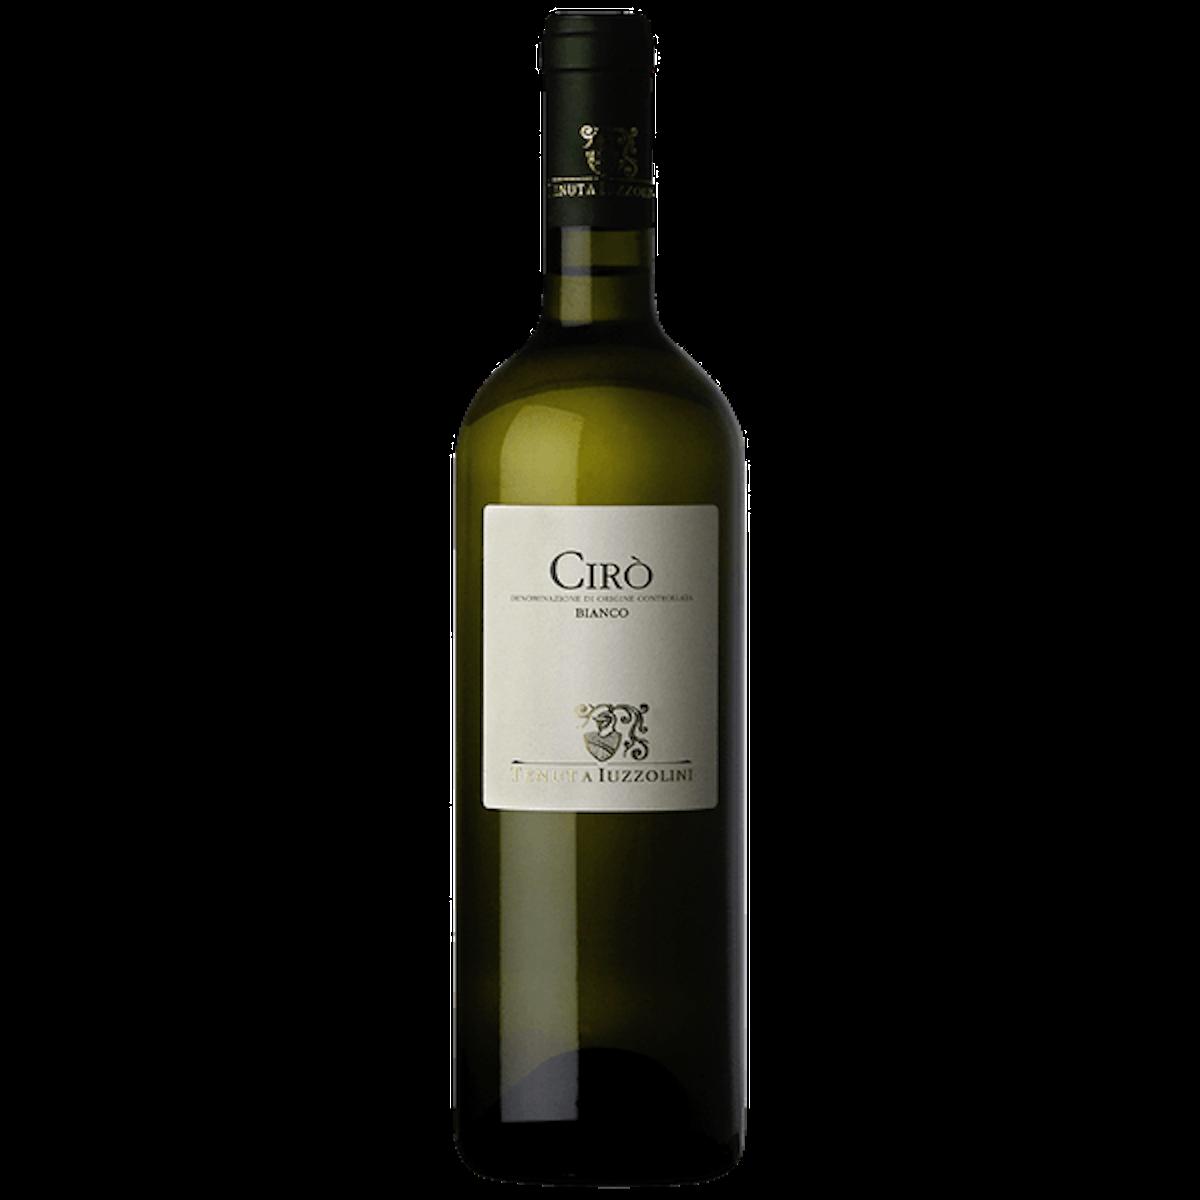 Ciro Bianco, 2020